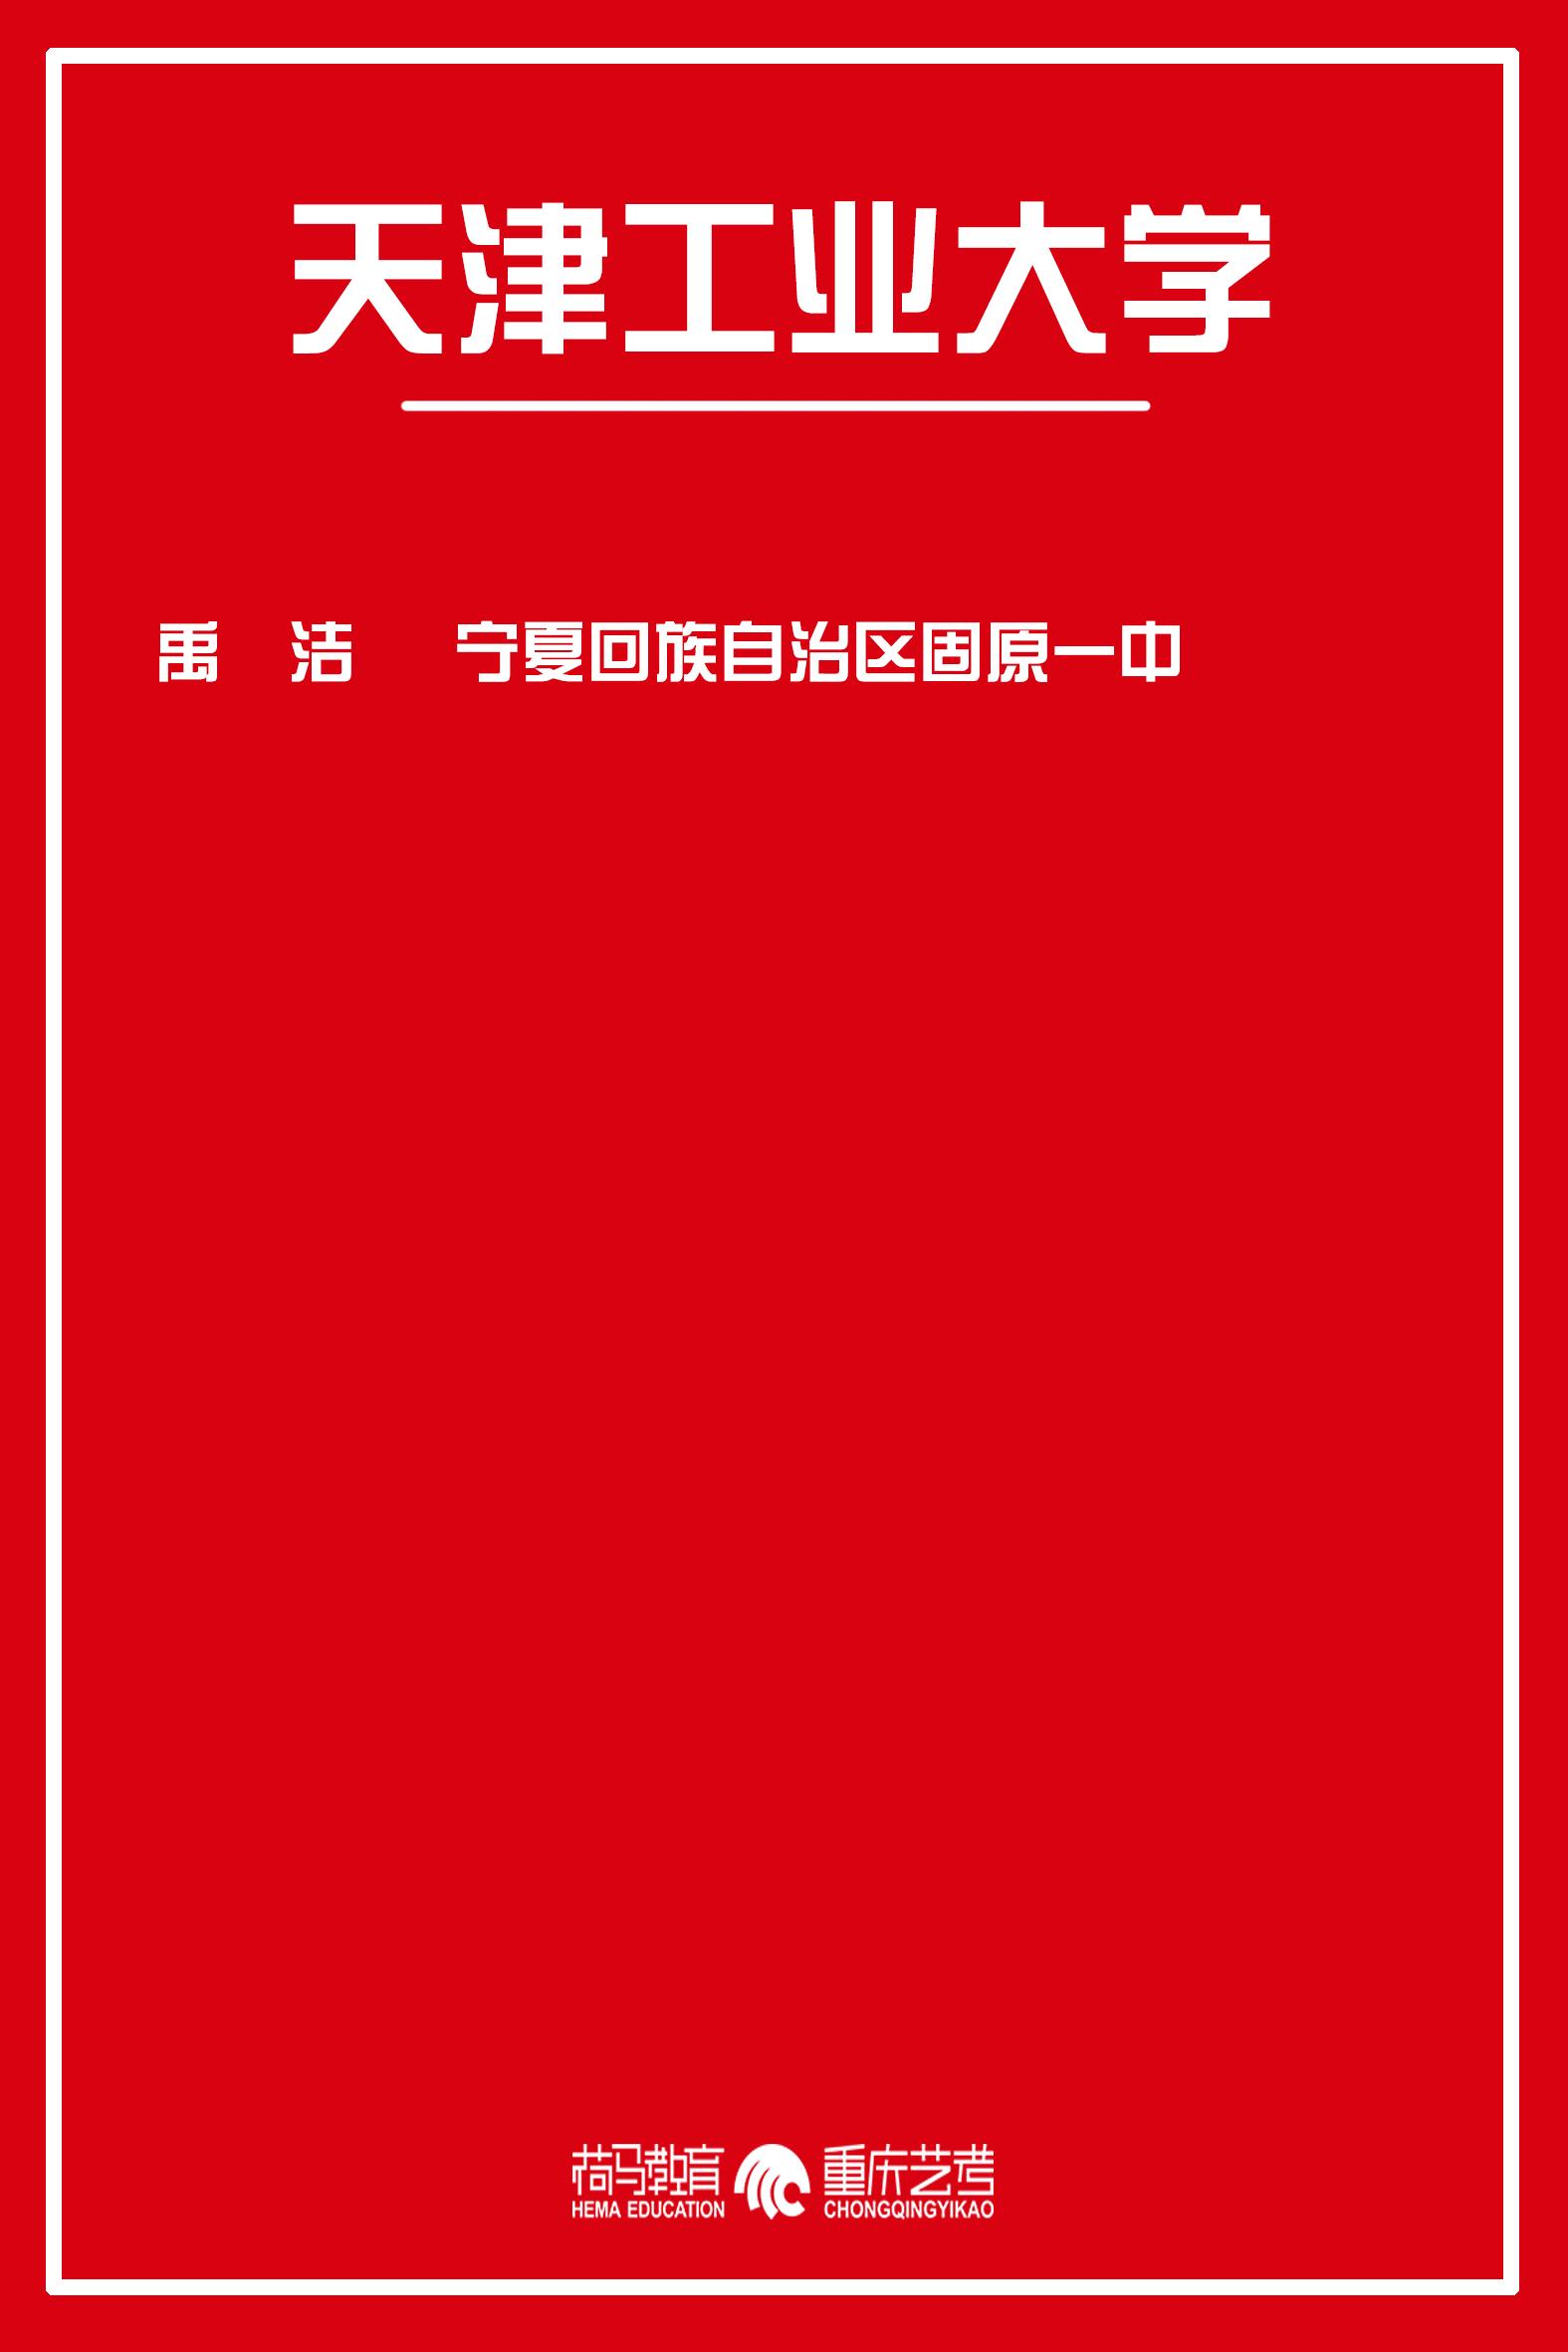 天津工业大学.jpg